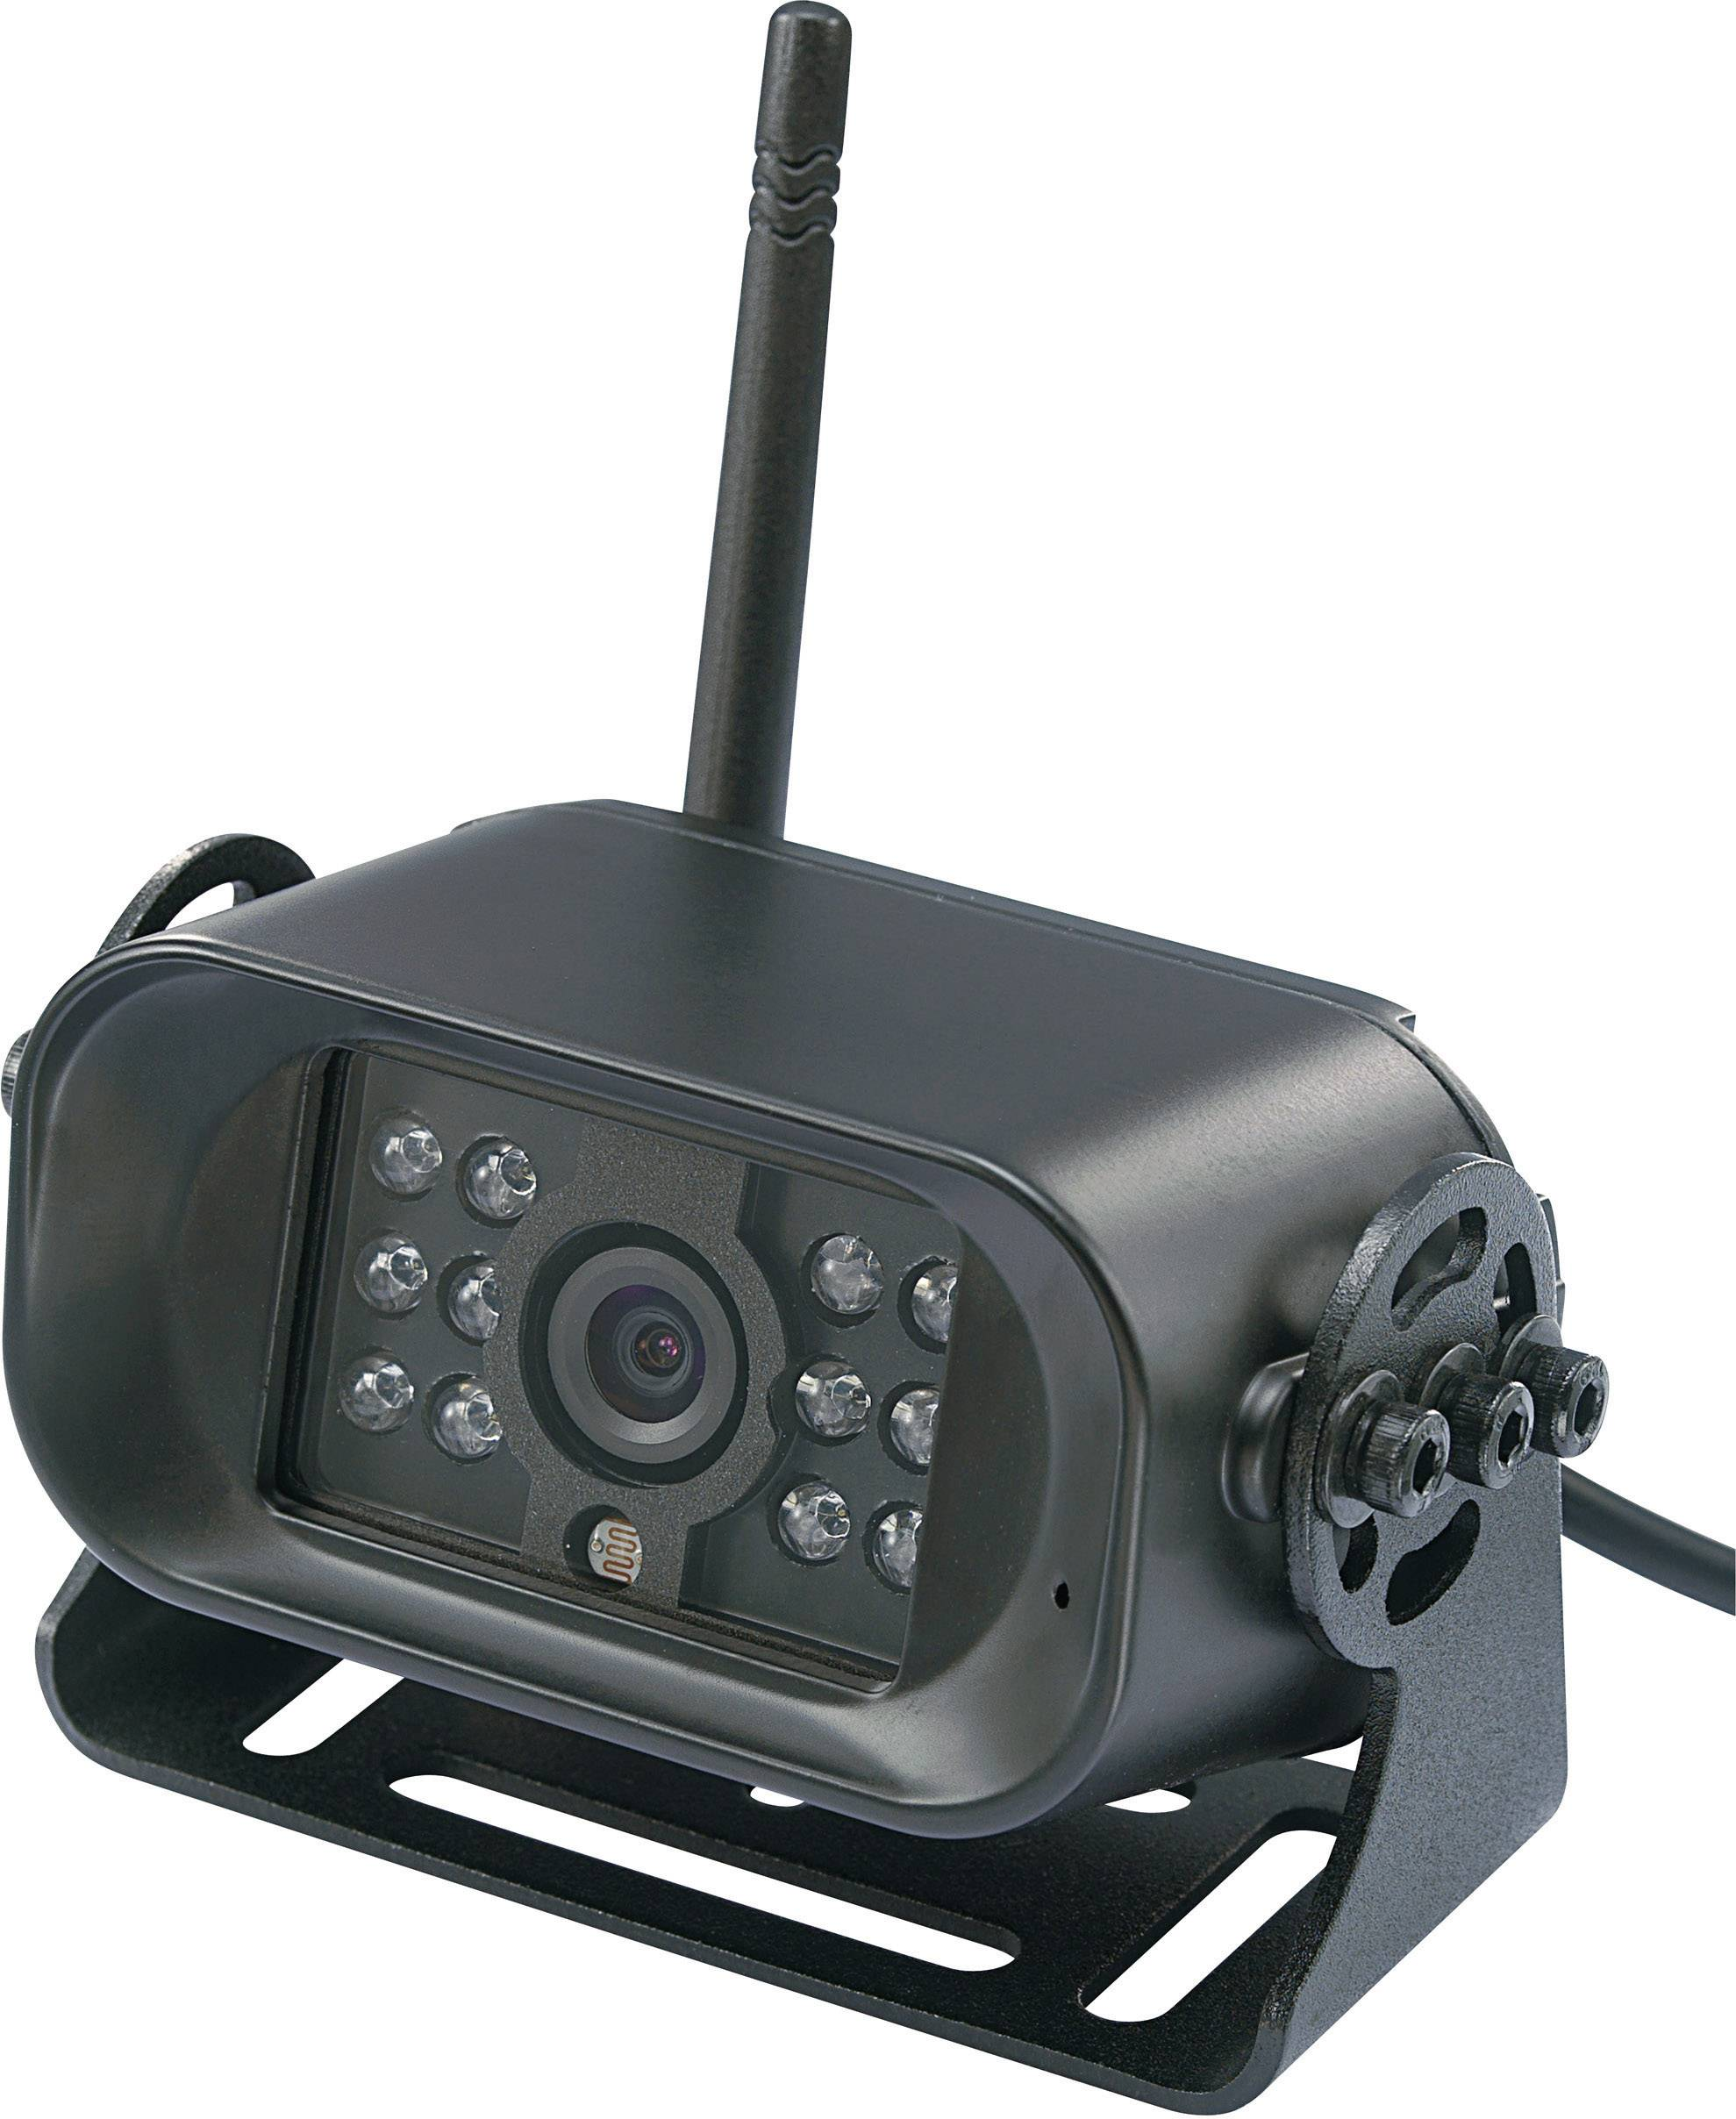 Draadloze achteruitrijcamera FFKK2 (Kanal 2) Extra IR-verlichting ...